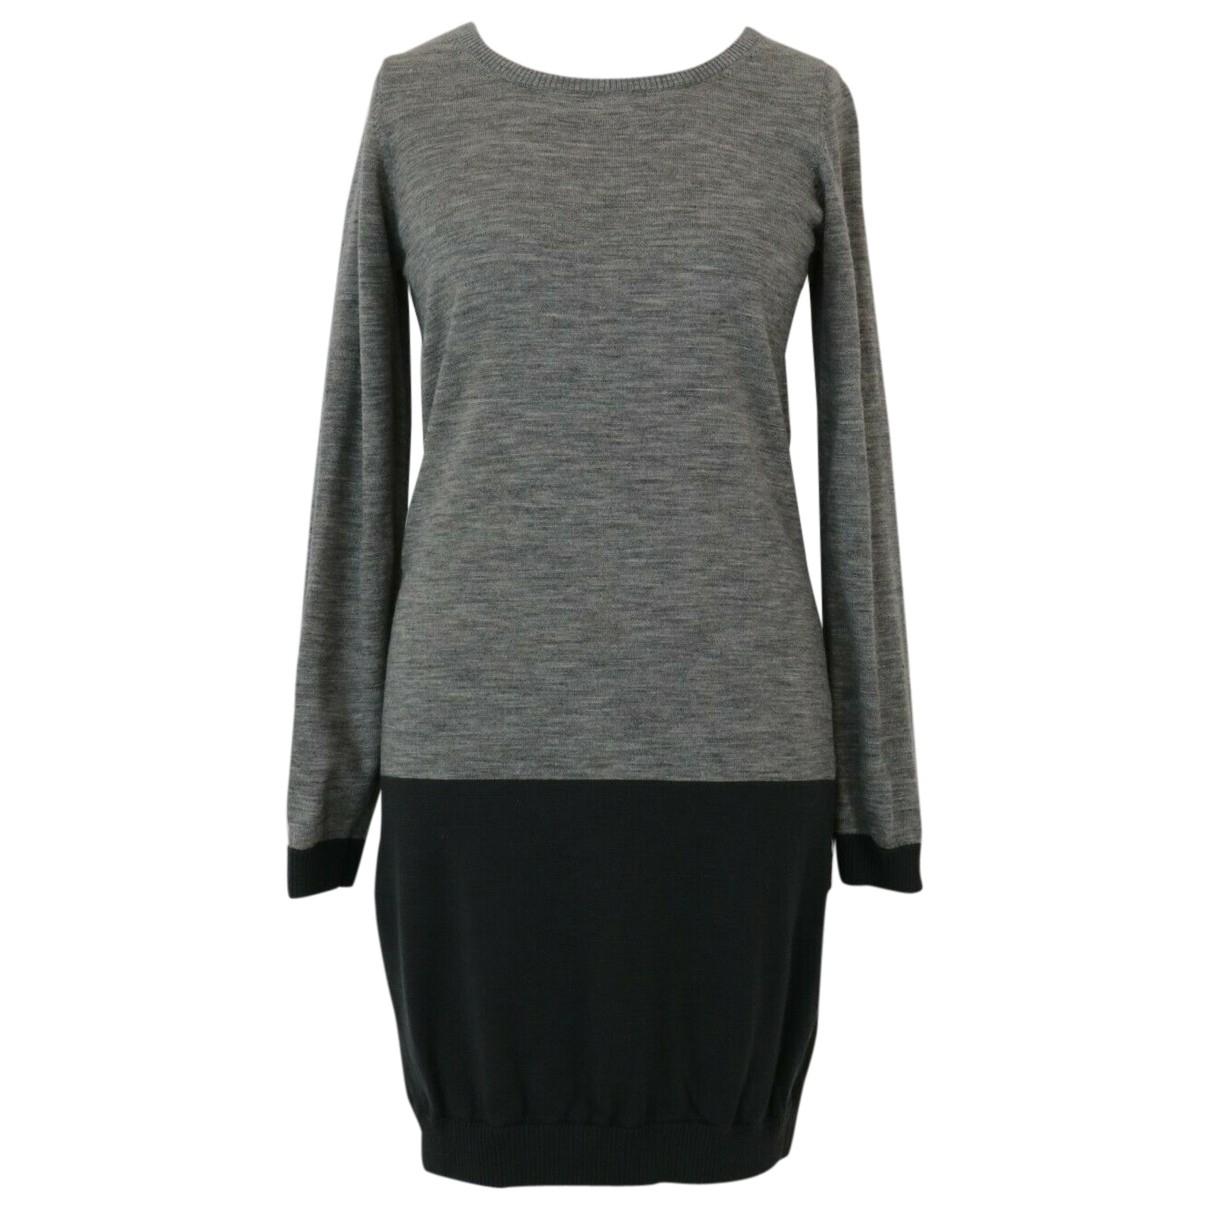 Bruuns Bazaar \N Grey Wool dress for Women L International